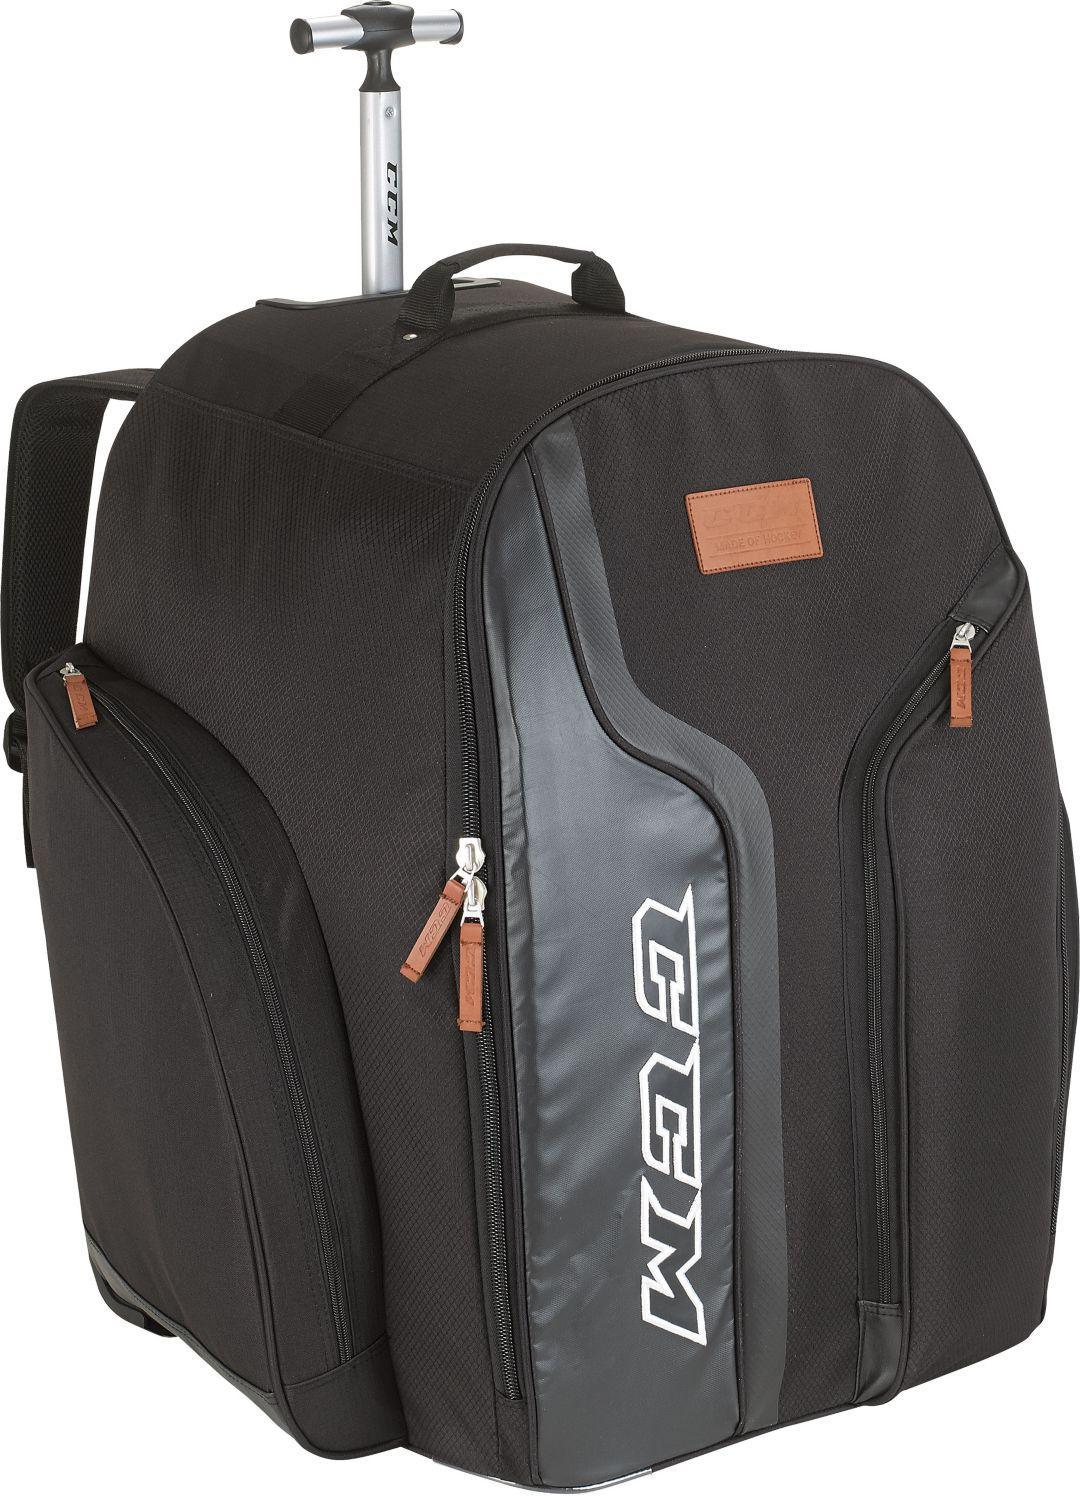 4f9ec4286 CCM 290 Medium Player Wheeled Hockey Backpack | DICK'S Sporting Goods